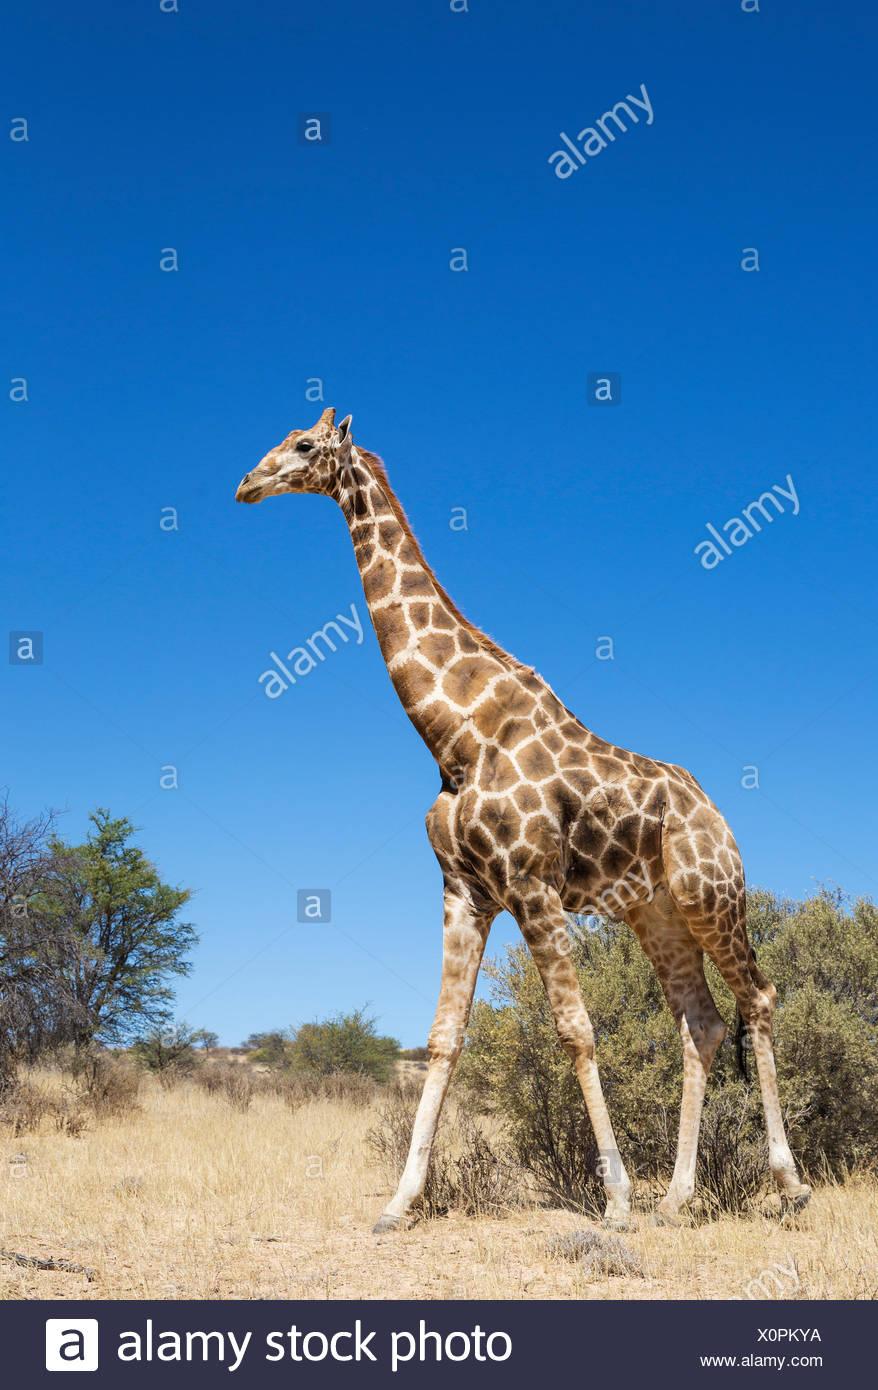 Le sud de Girafe (Giraffa giraffa), âgés de sexe masculin, désert du Kalahari, kgalagadi transfrontier Park, Afrique du Sud Photo Stock